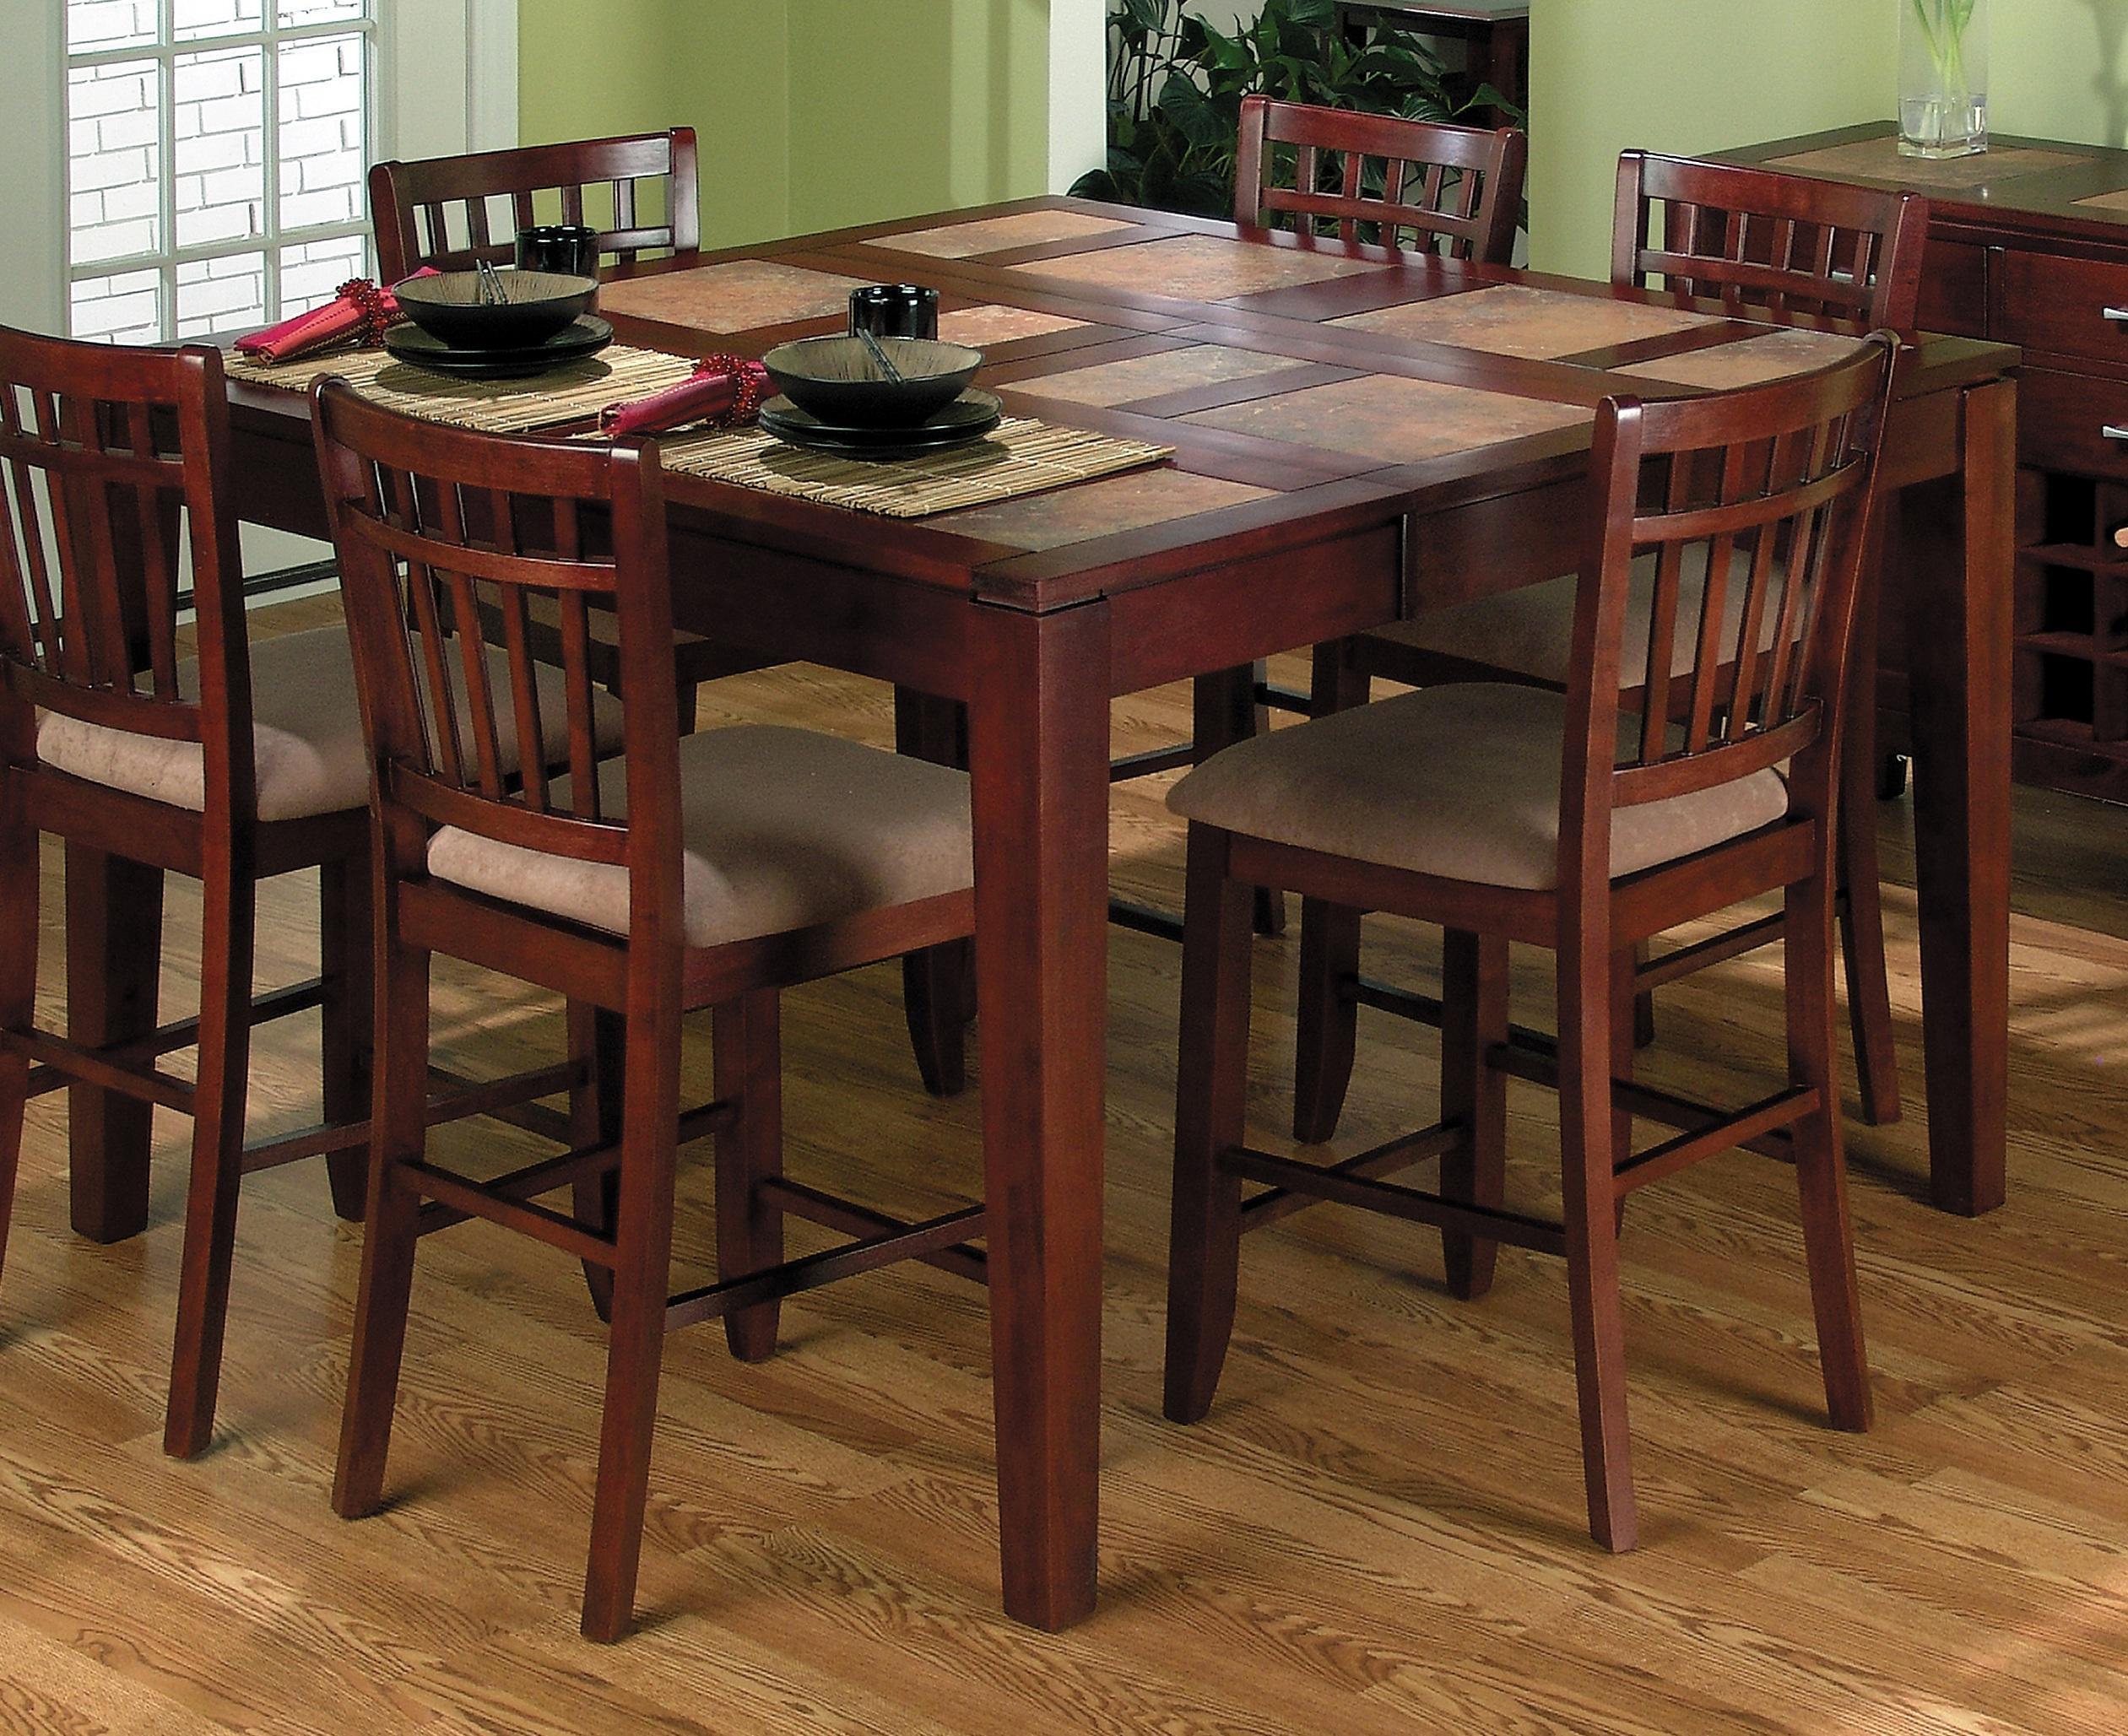 Small Dinette Set Design  HomesFeed